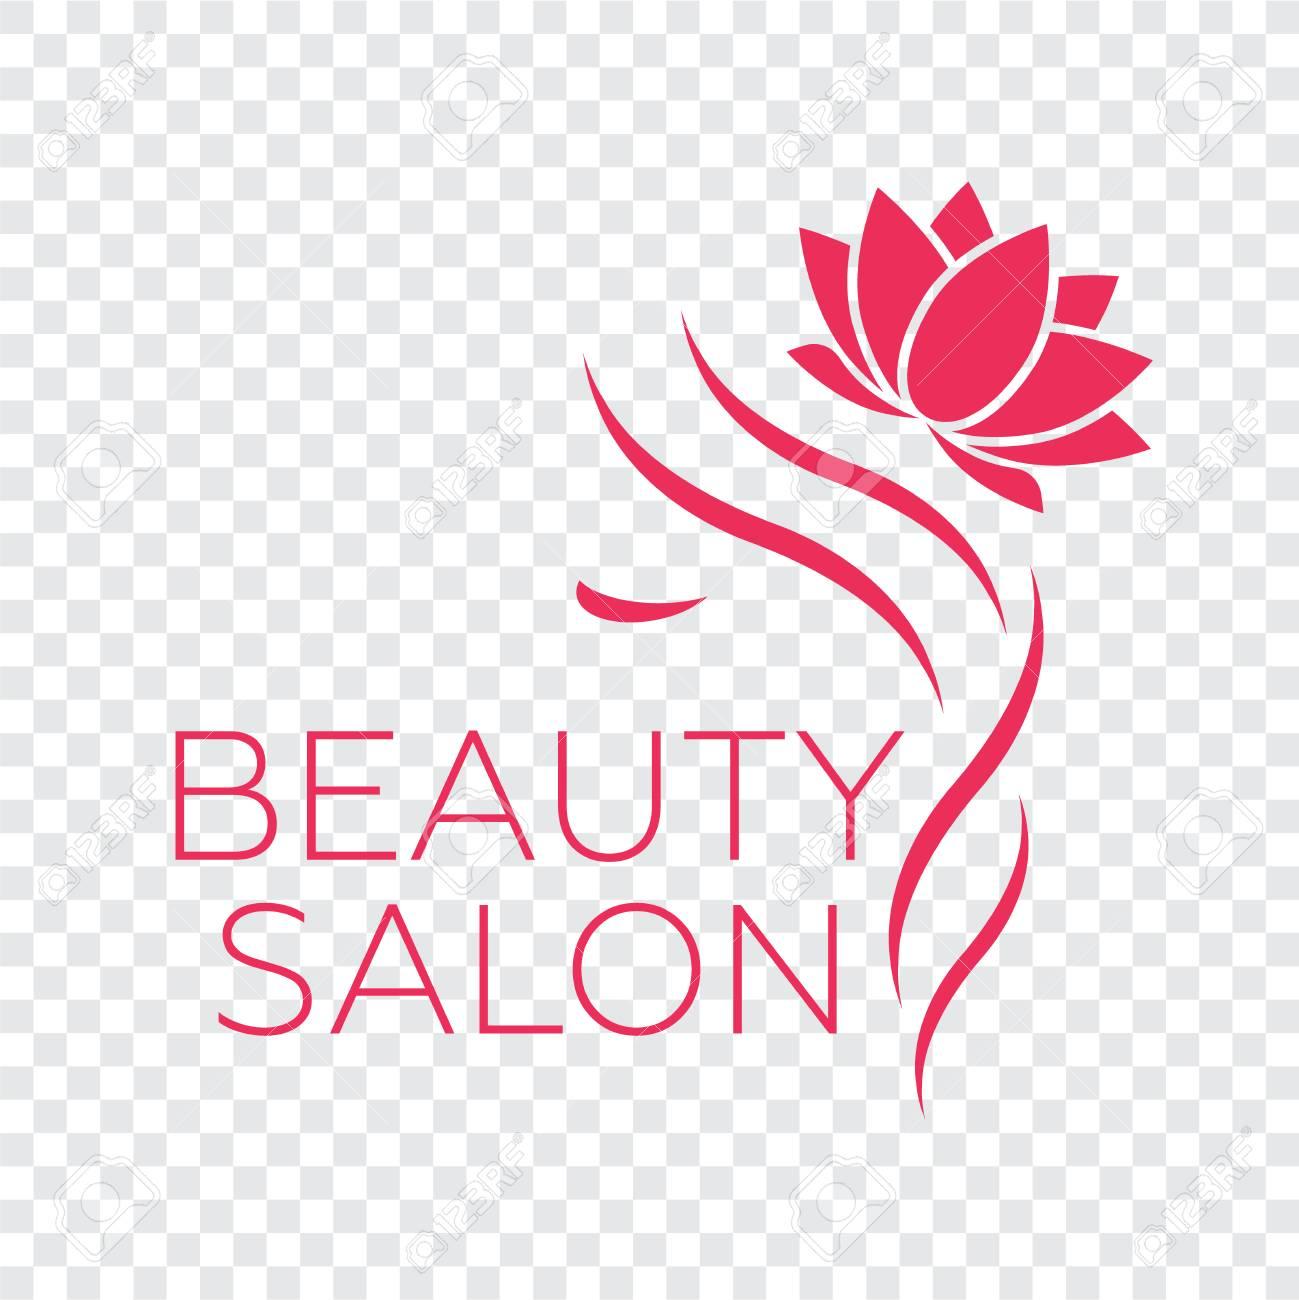 Beauty Logo For Hair Salon Logo Hair Vector Royalty Free Cliparts Vectors And Stock Illustration Image 93391161